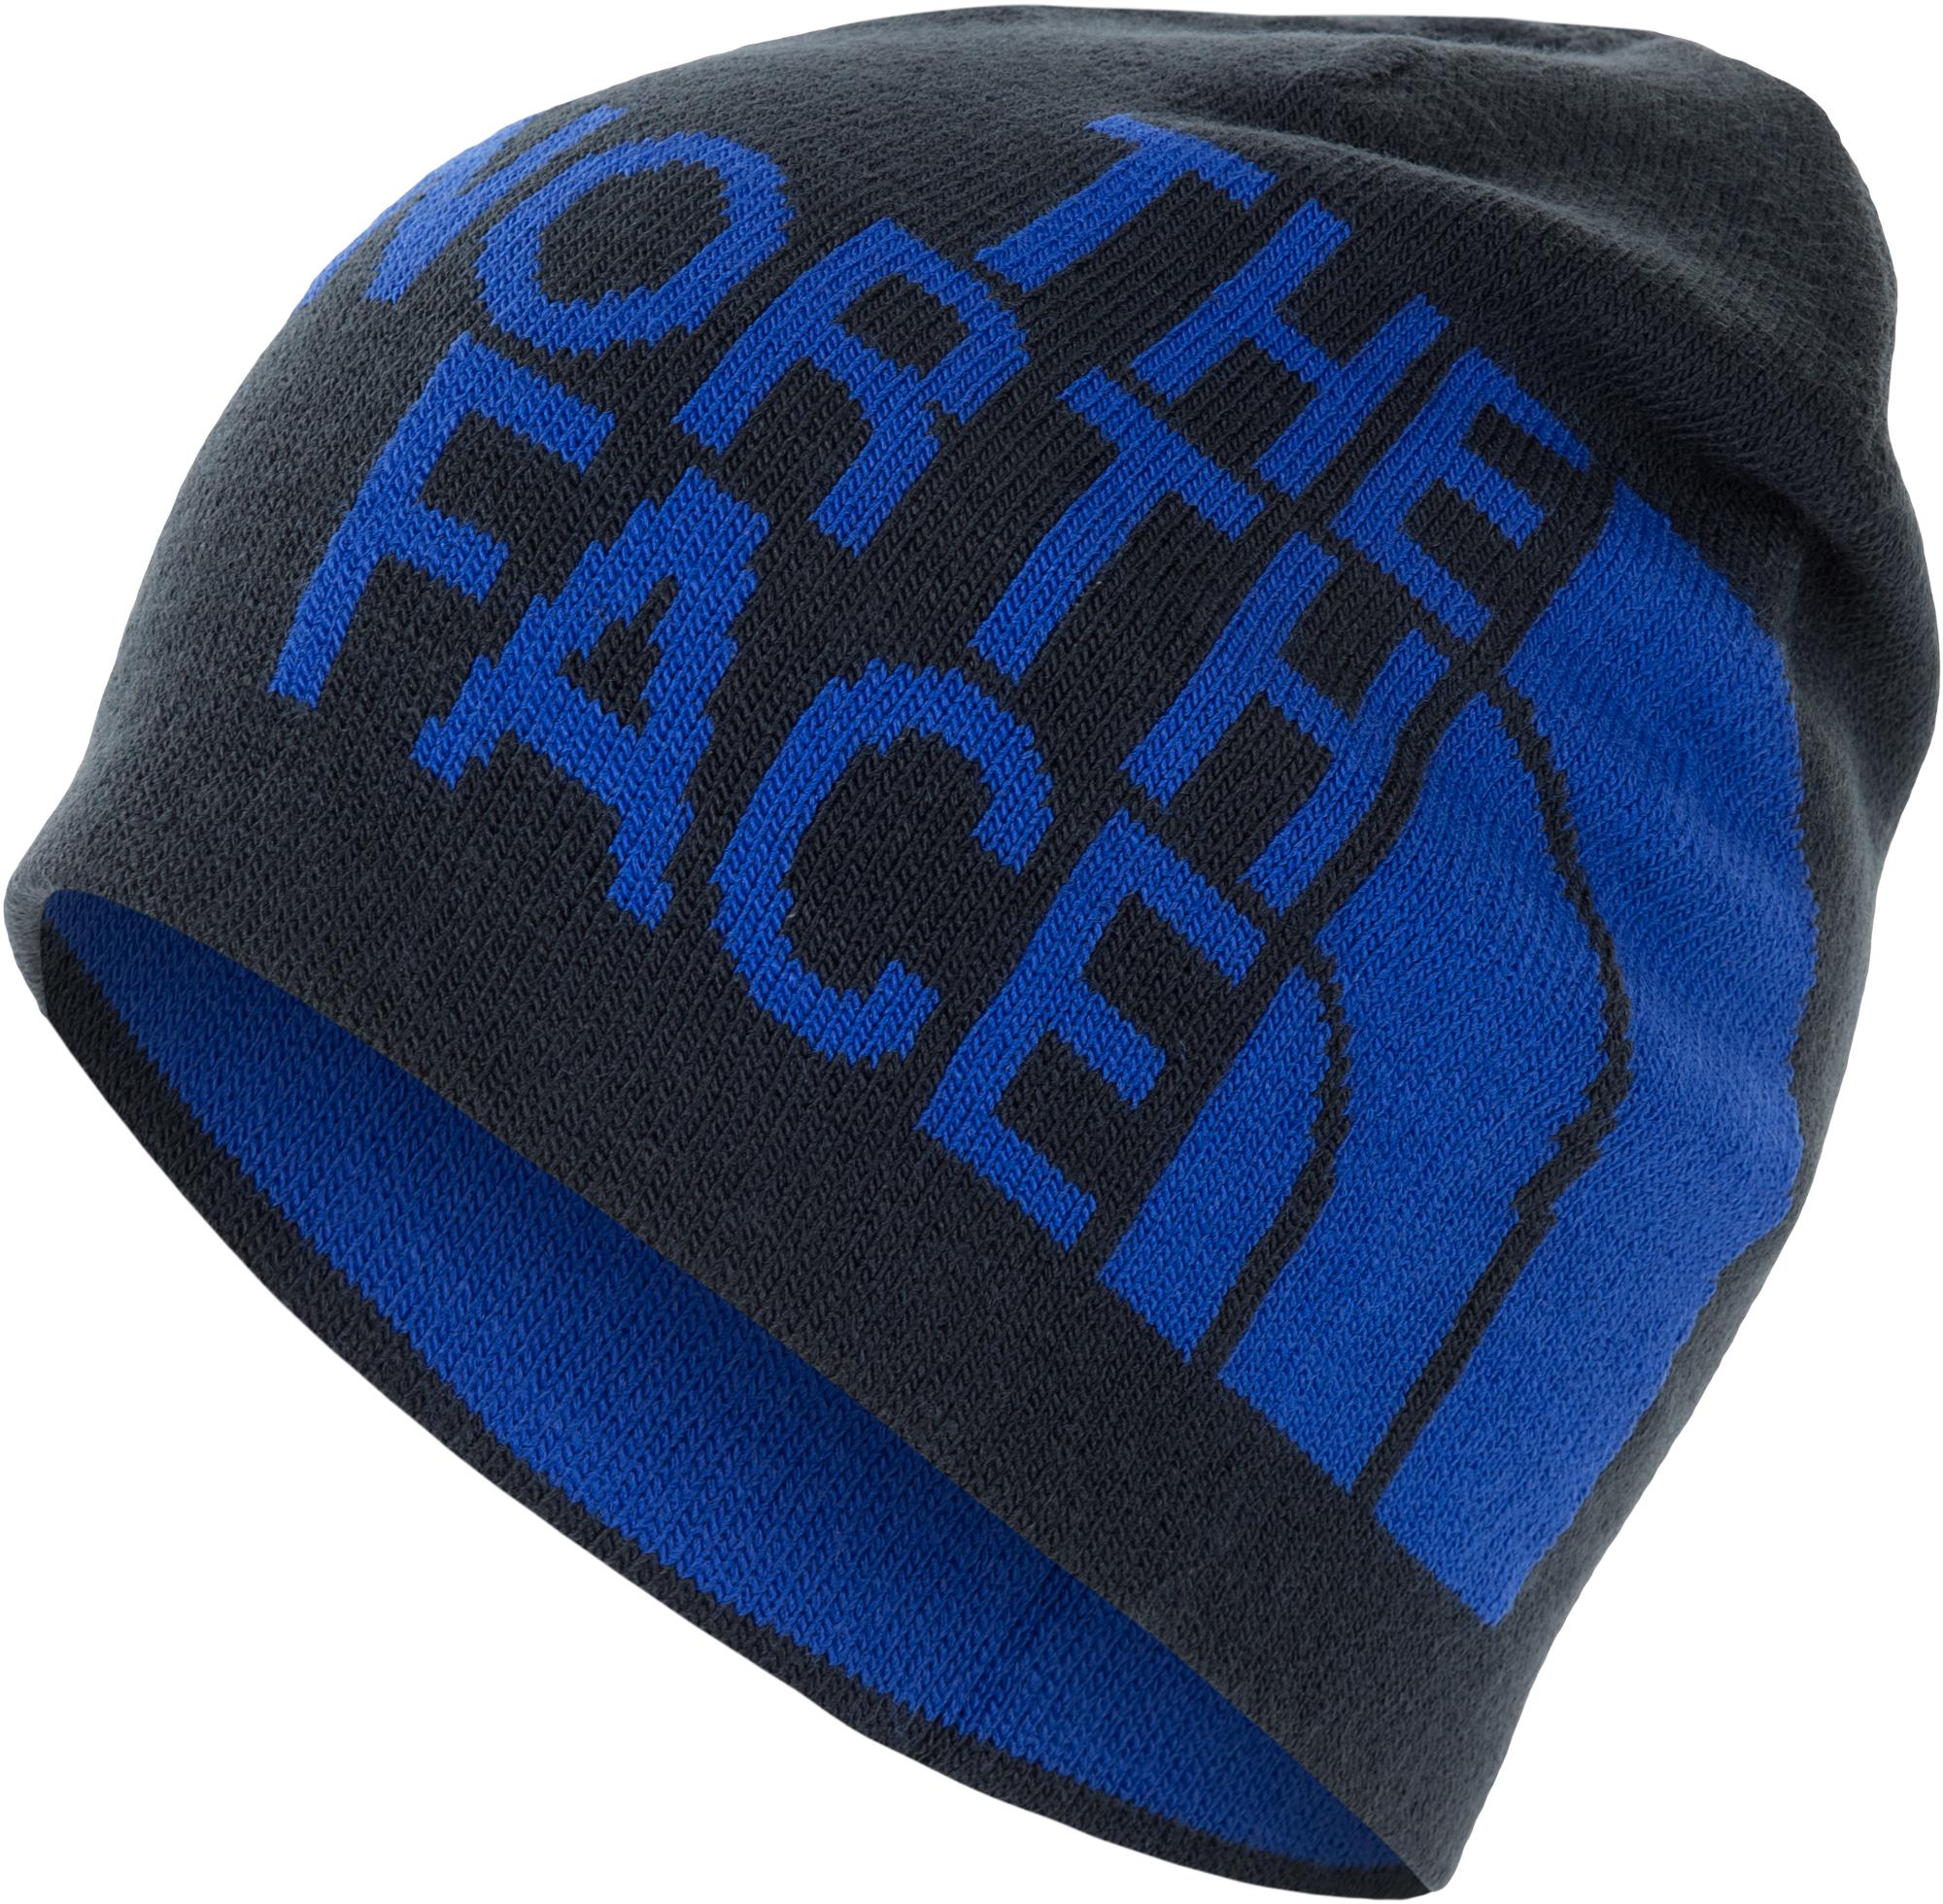 купить The North Face Шапка The North Face Reversible Banner Beanie по цене 2399 рублей